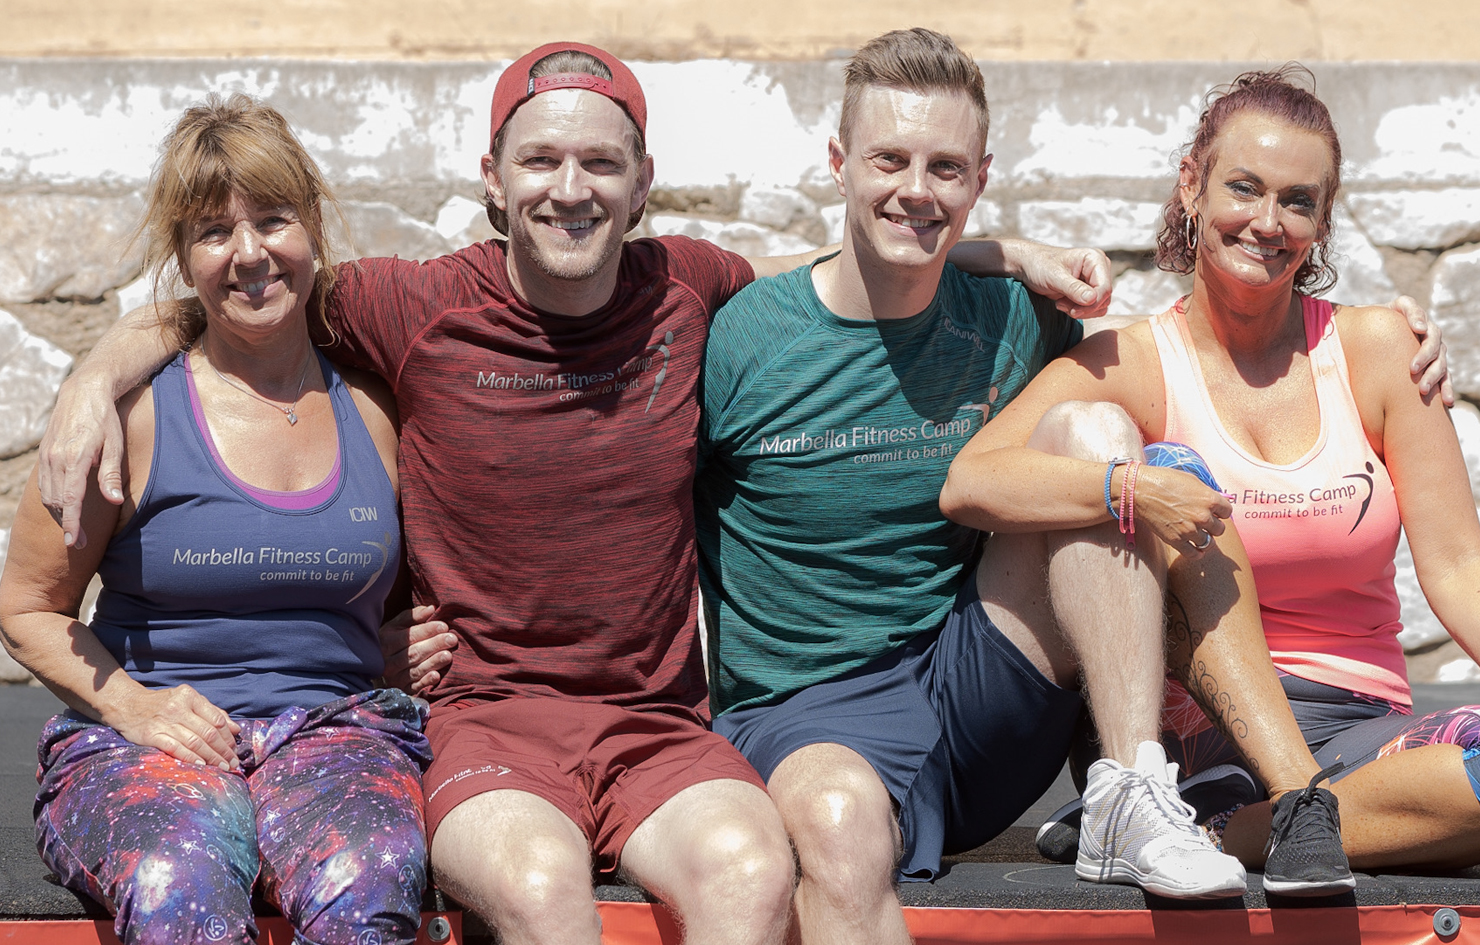 Dance Camp Uge 19  - Marbella